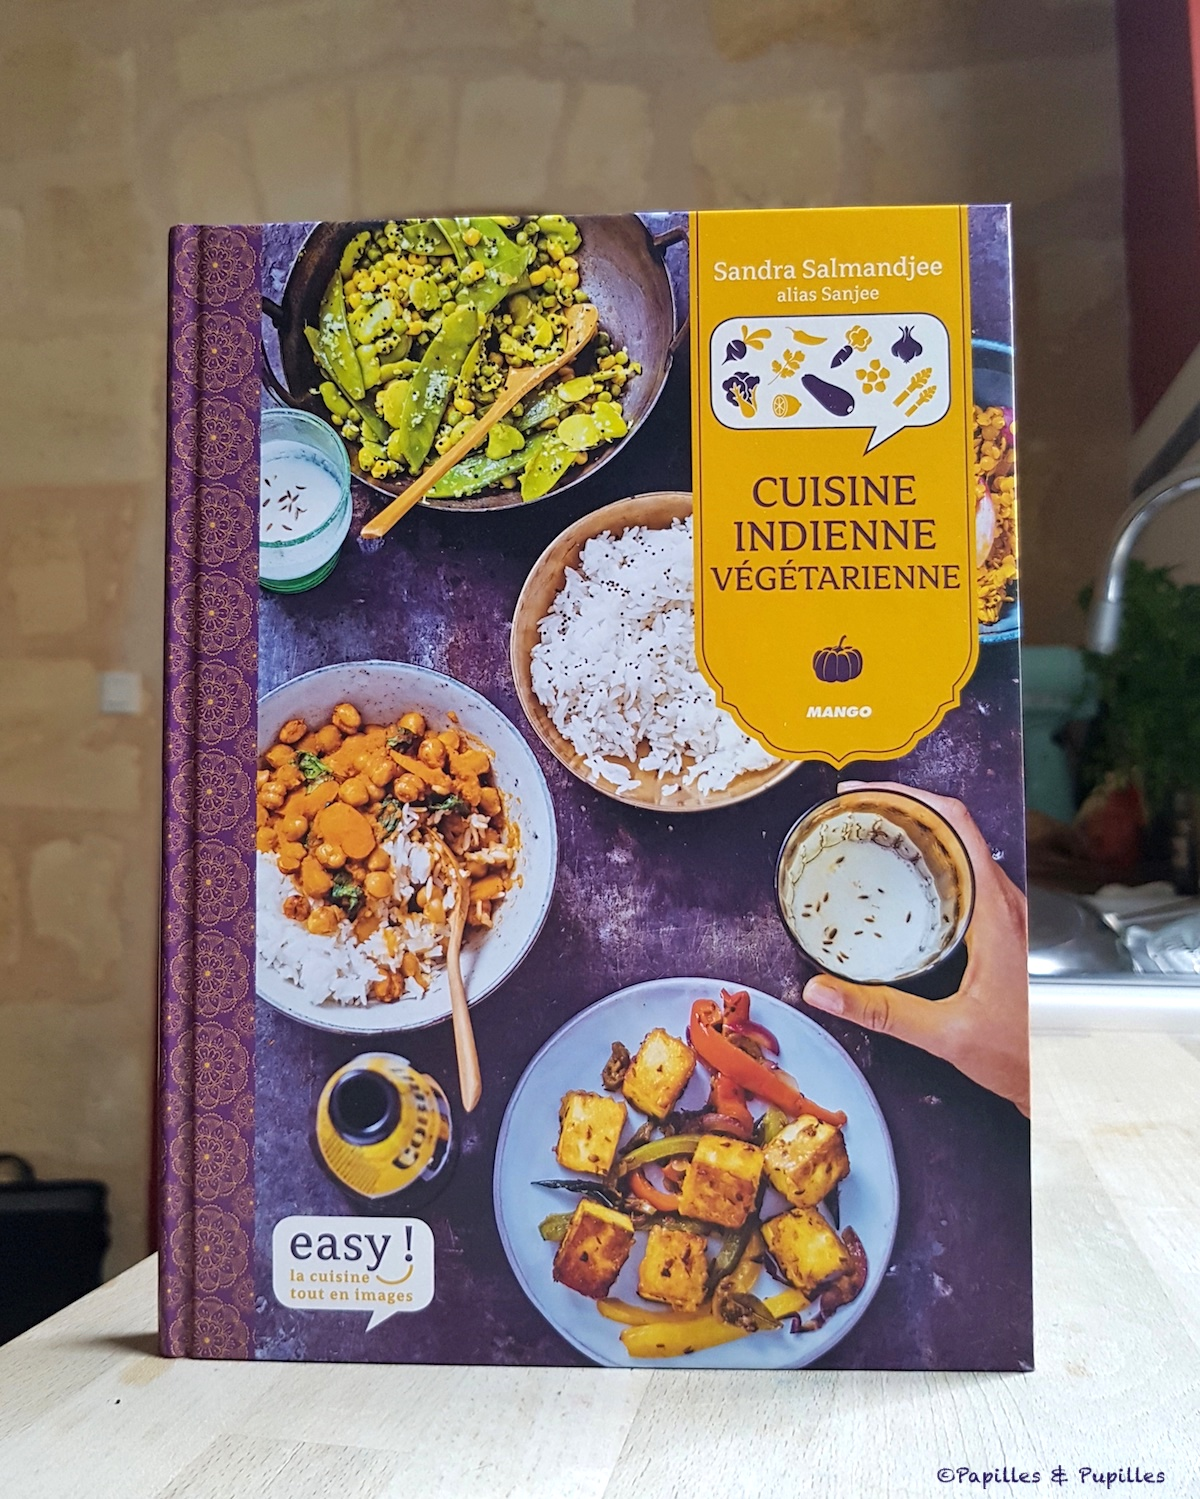 Cuisine indienne végétarienne - Sandra Salmandjee